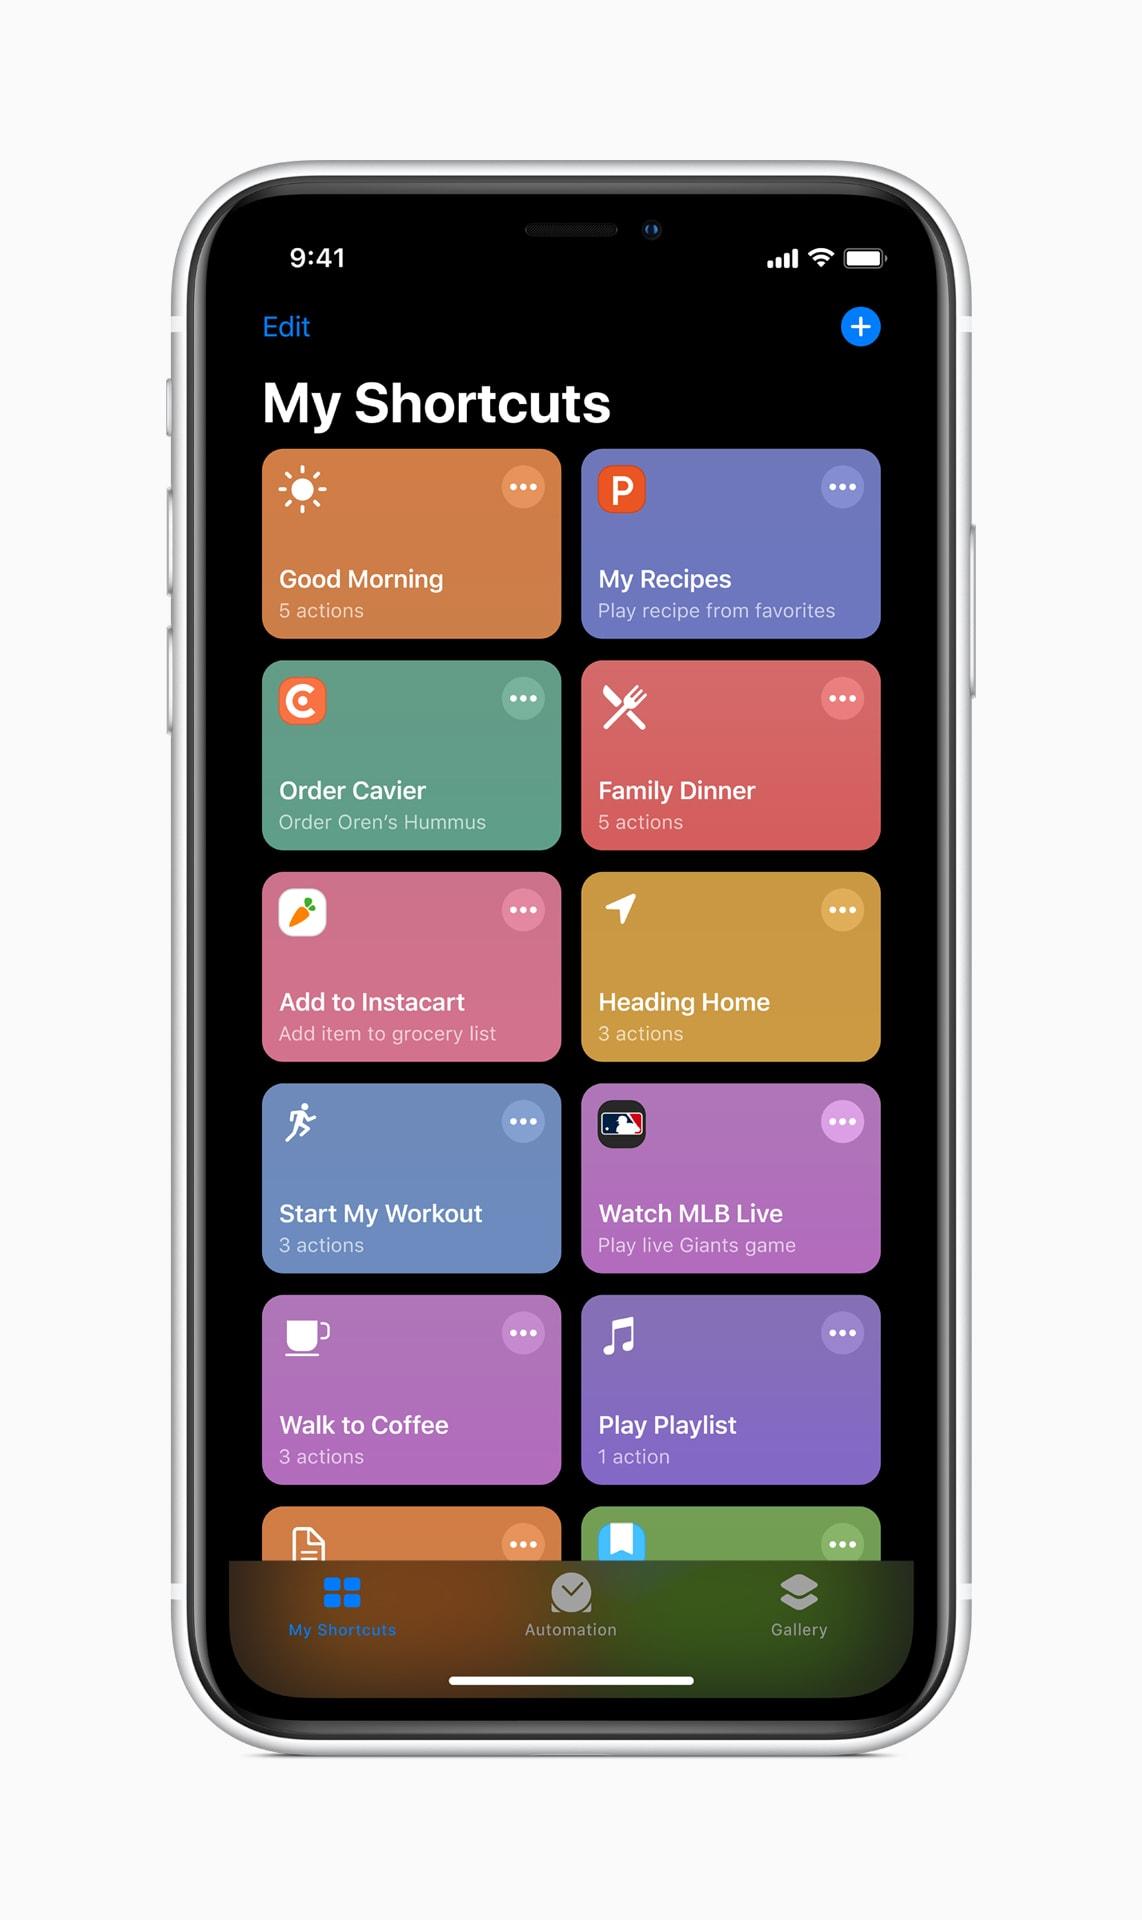 Siri shortcuts running on iOS 13